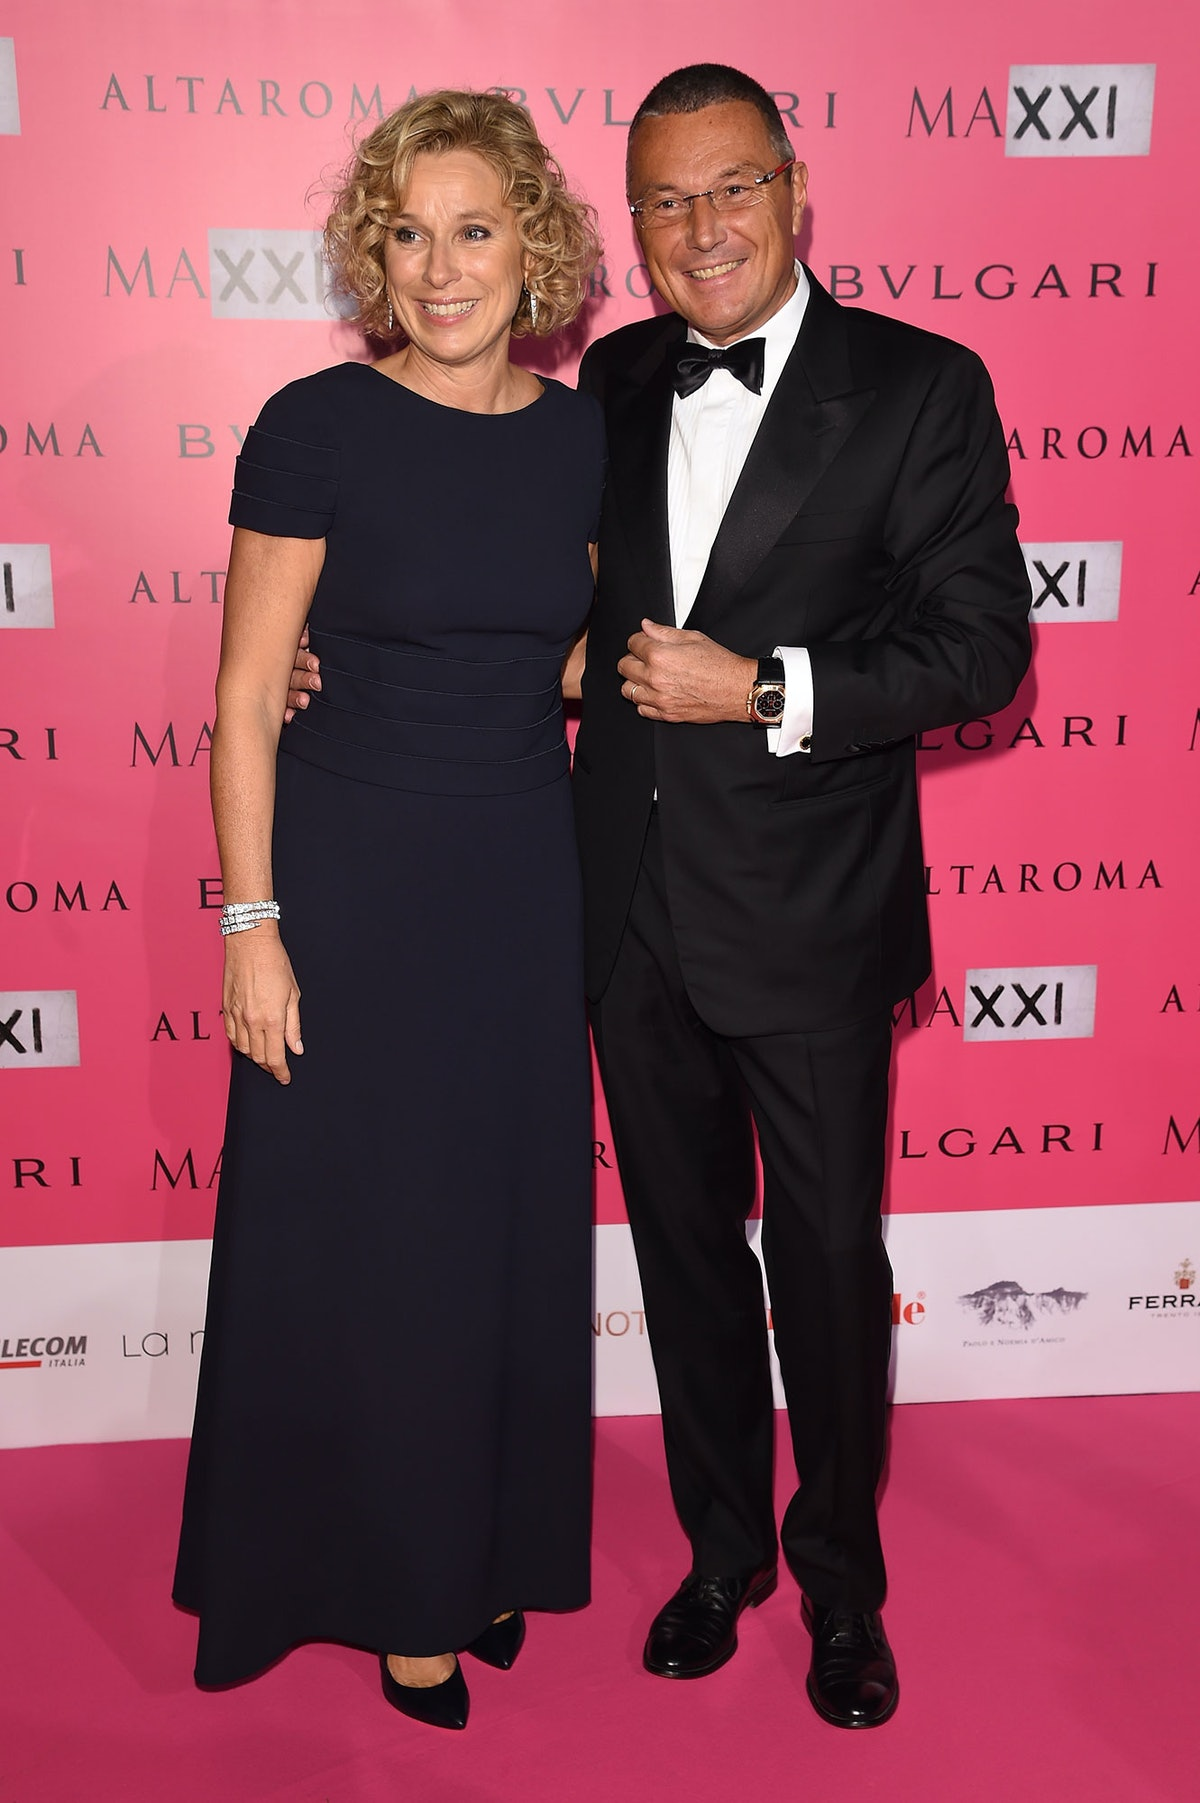 Giovanna Melandri and Jean Christophe Babin